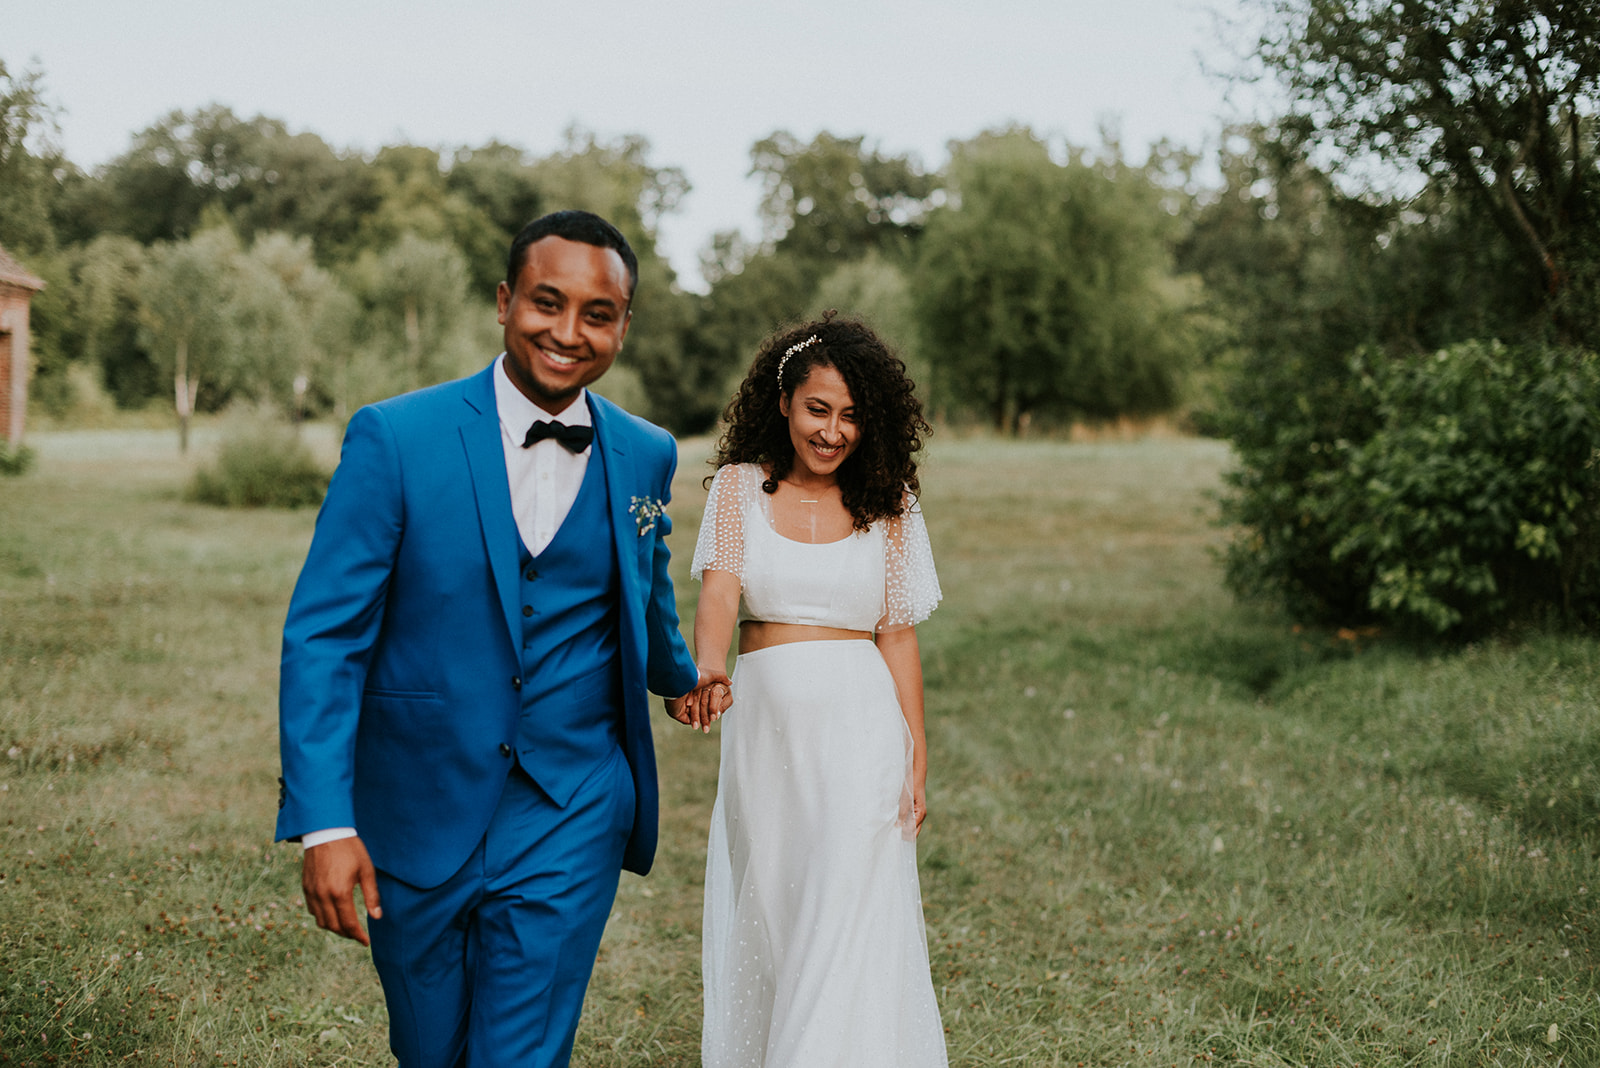 Mariage de Teddy et Arielle-668.jpg